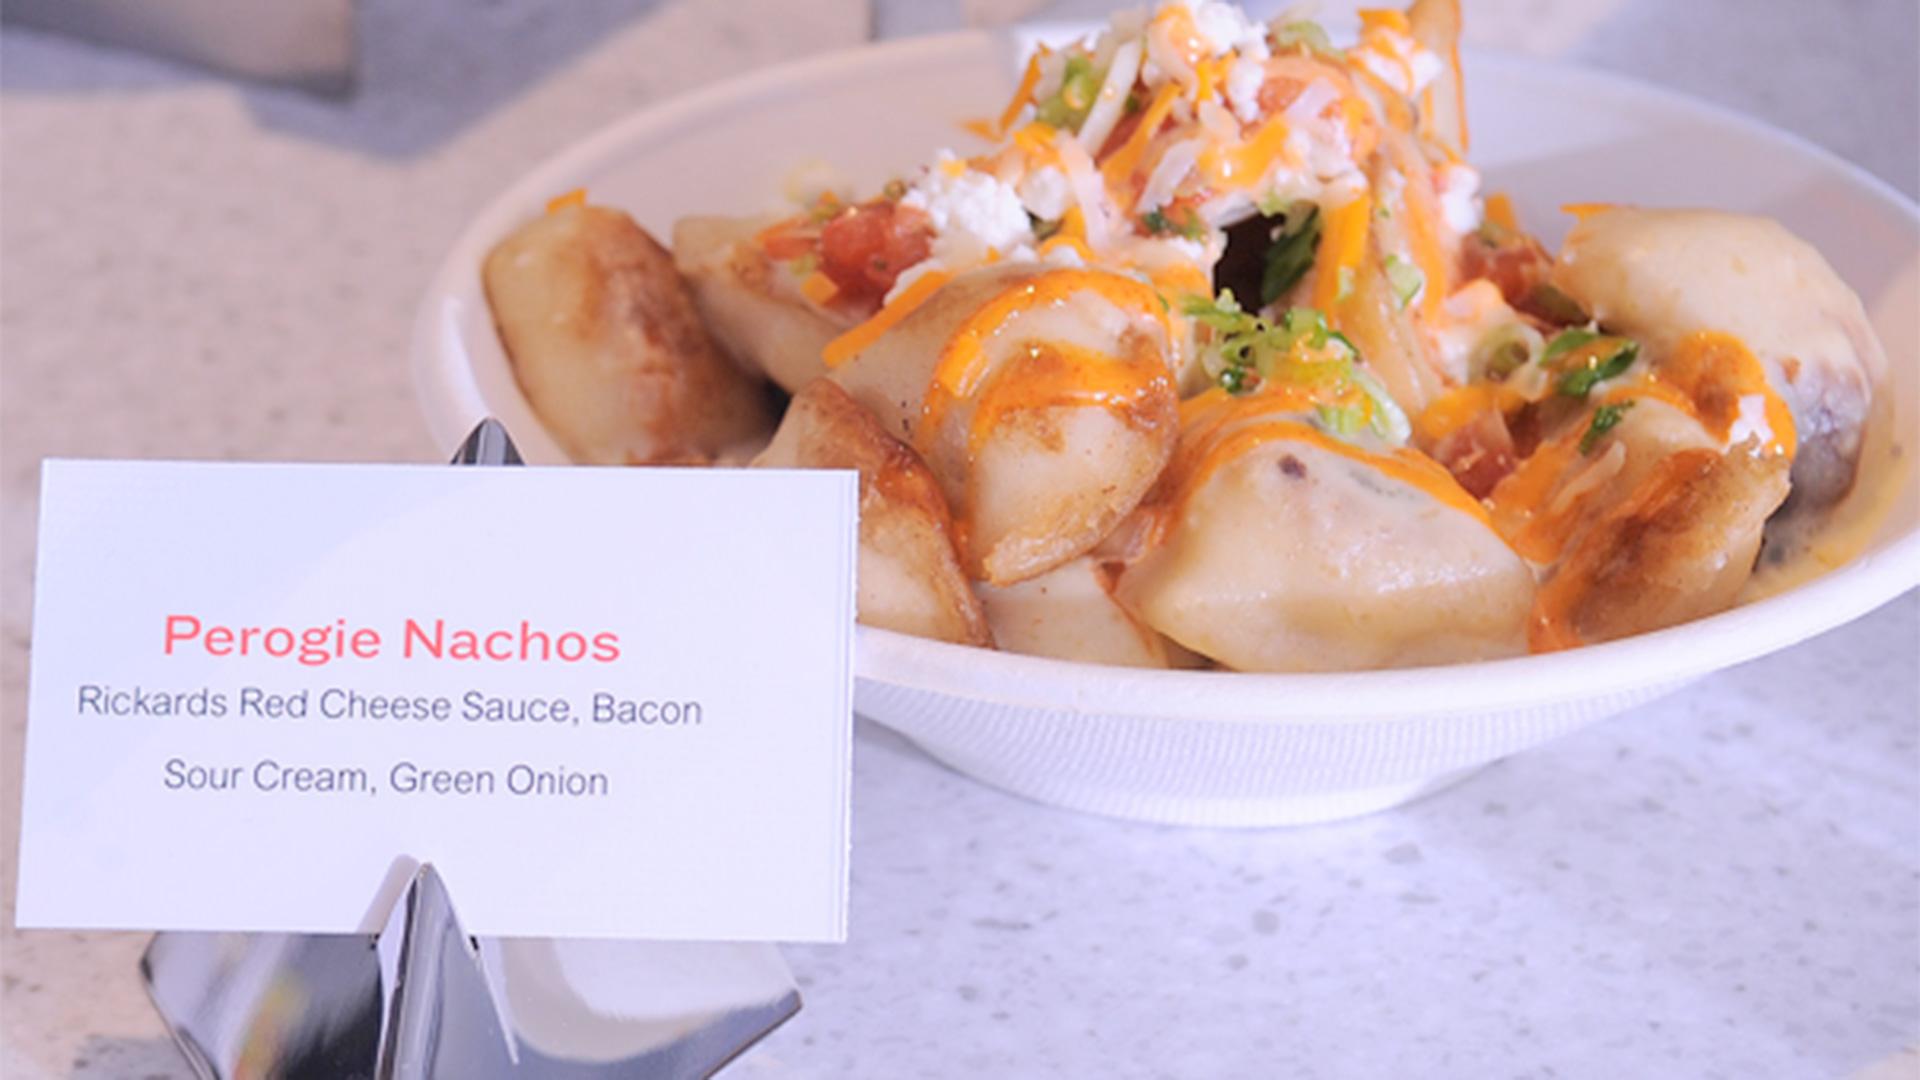 perogie perogy nachos food